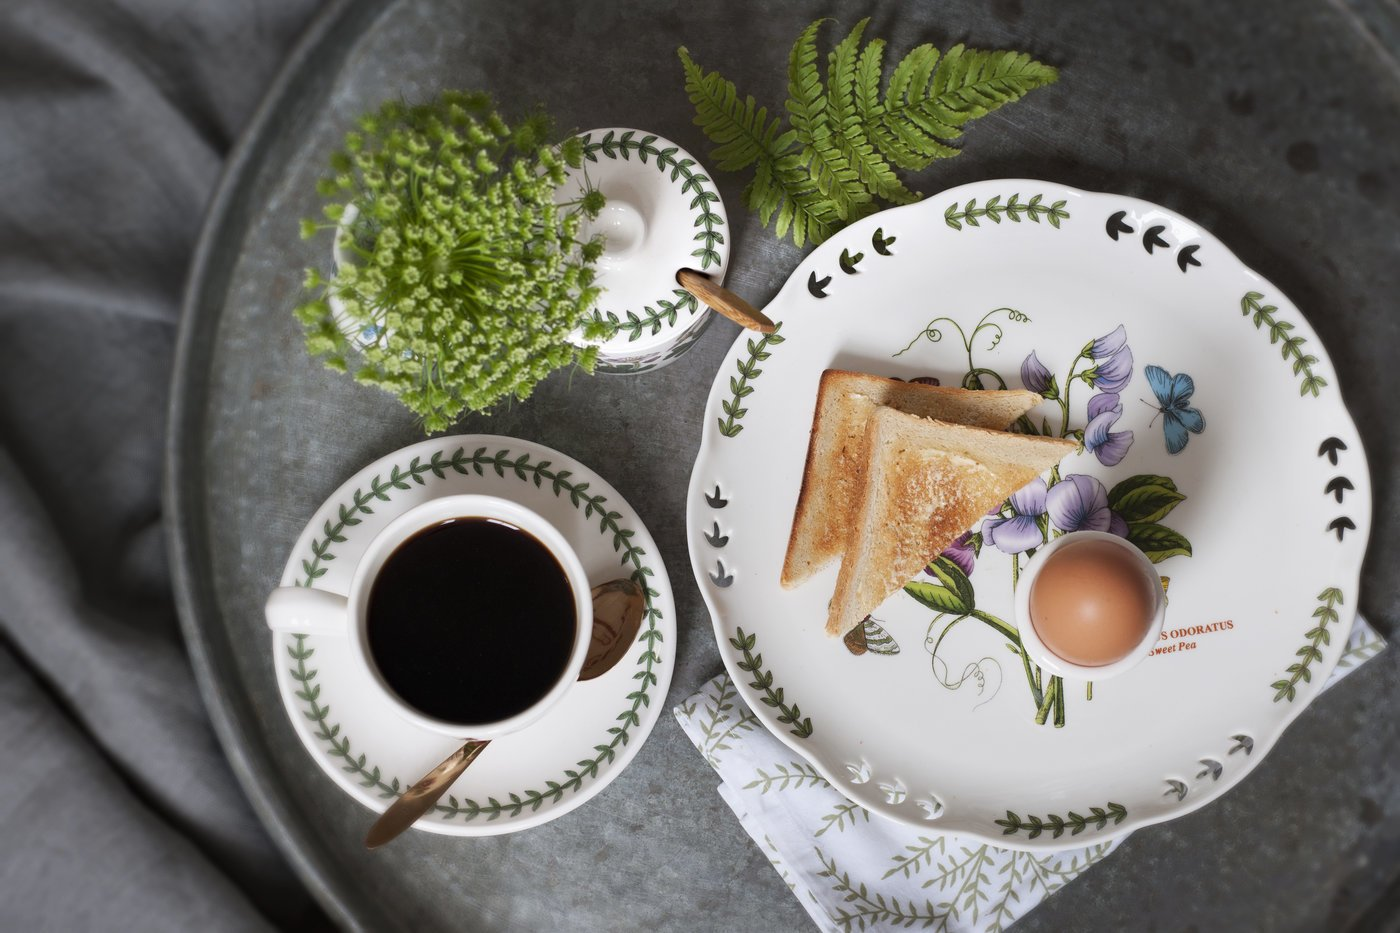 Portmeirion Botanic Garden Dinner Plates, Set of 6 Assorted Motifs by Portmeirion (Image #3)